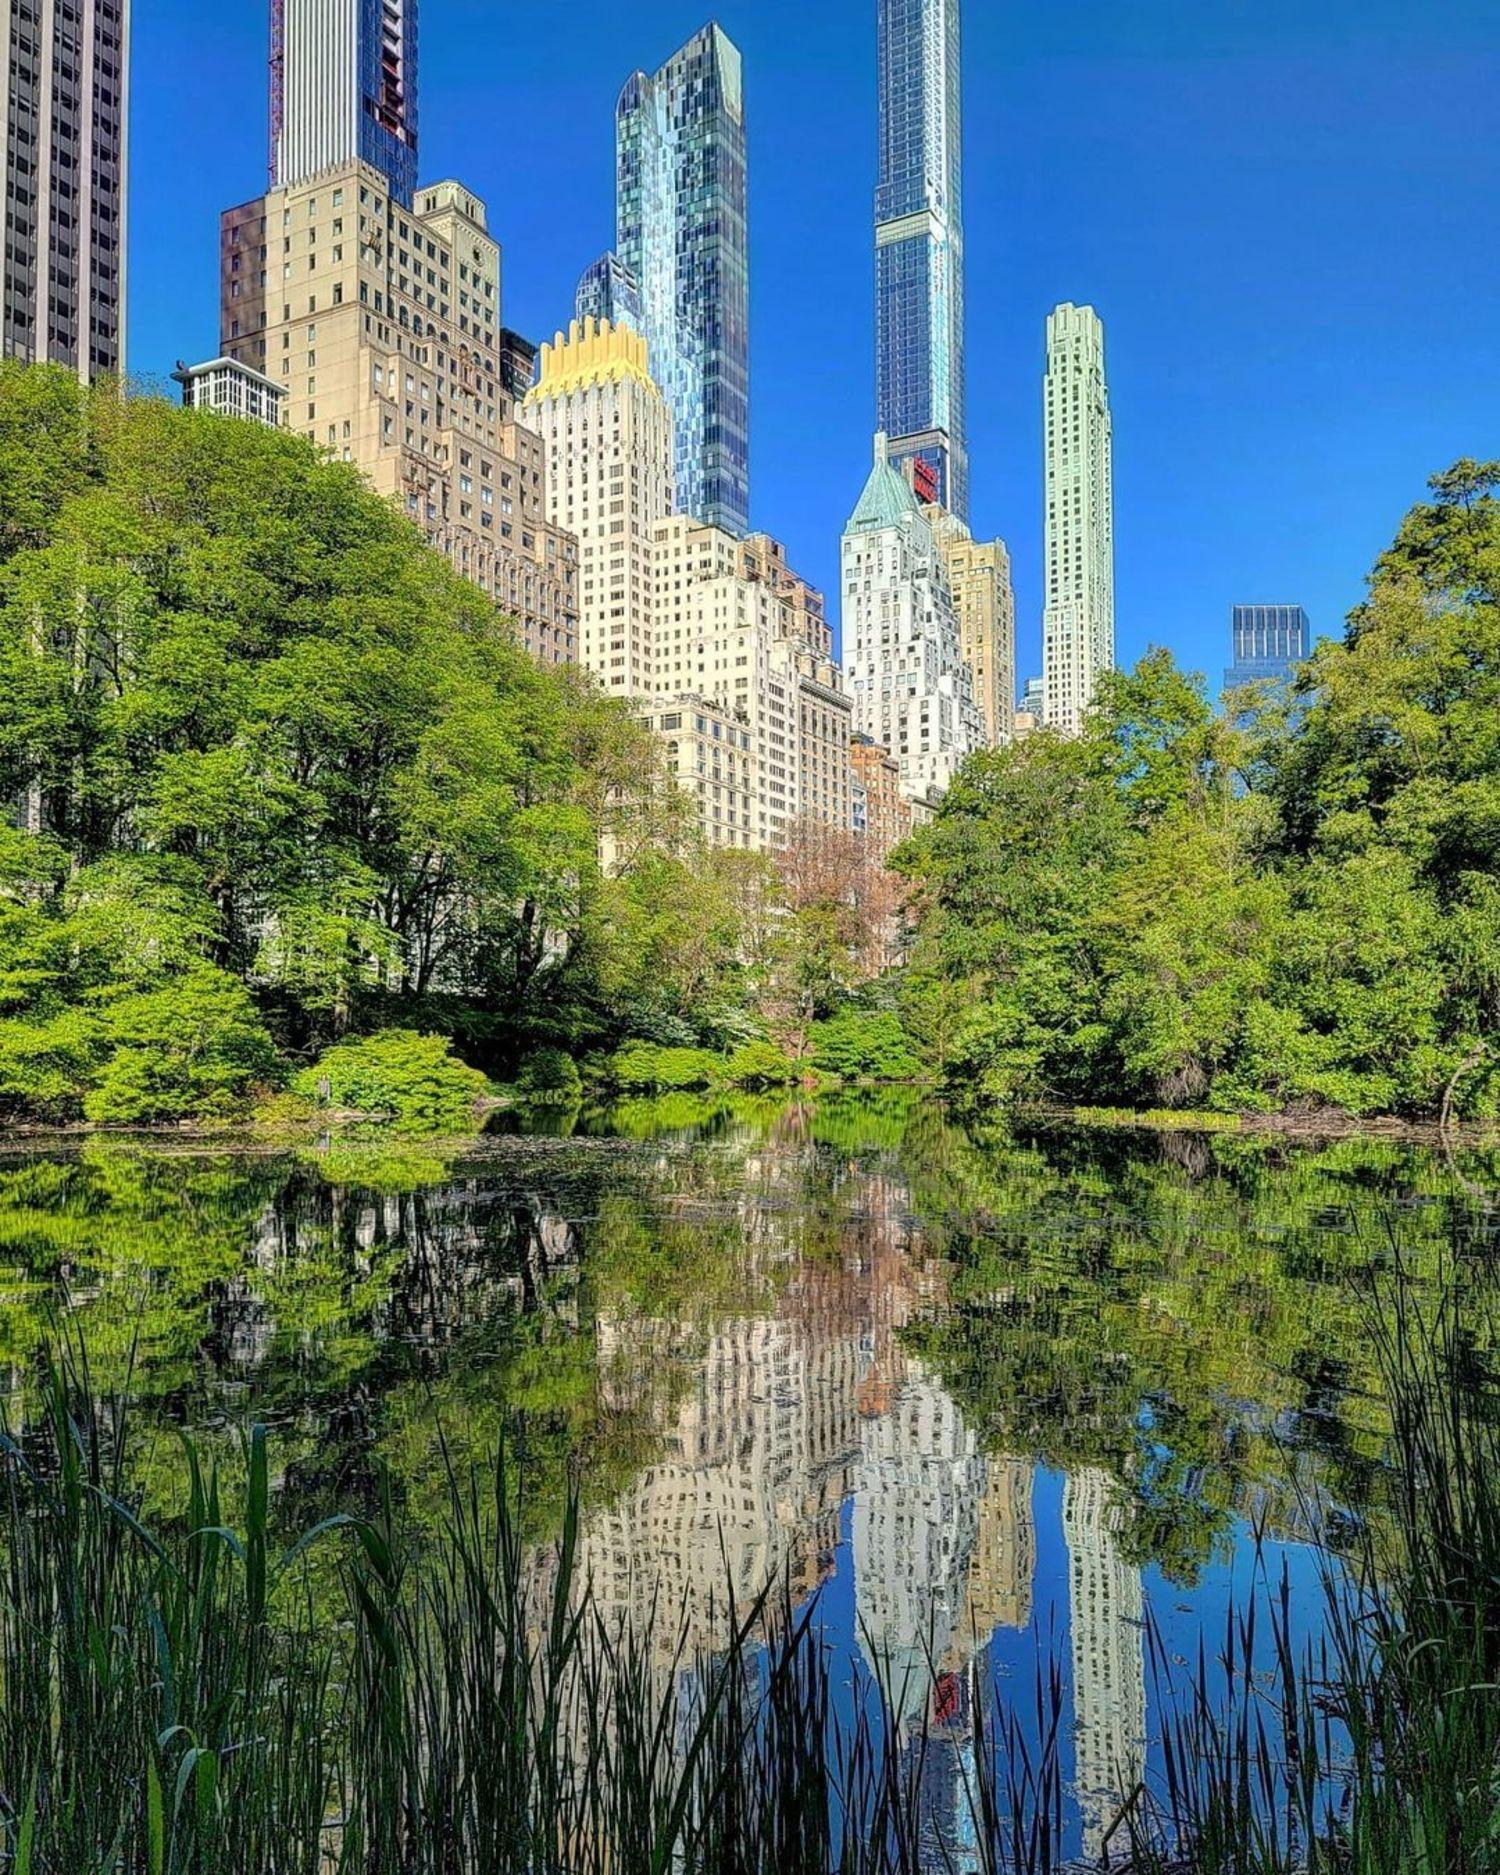 The Pond, Central Park, Manhattan